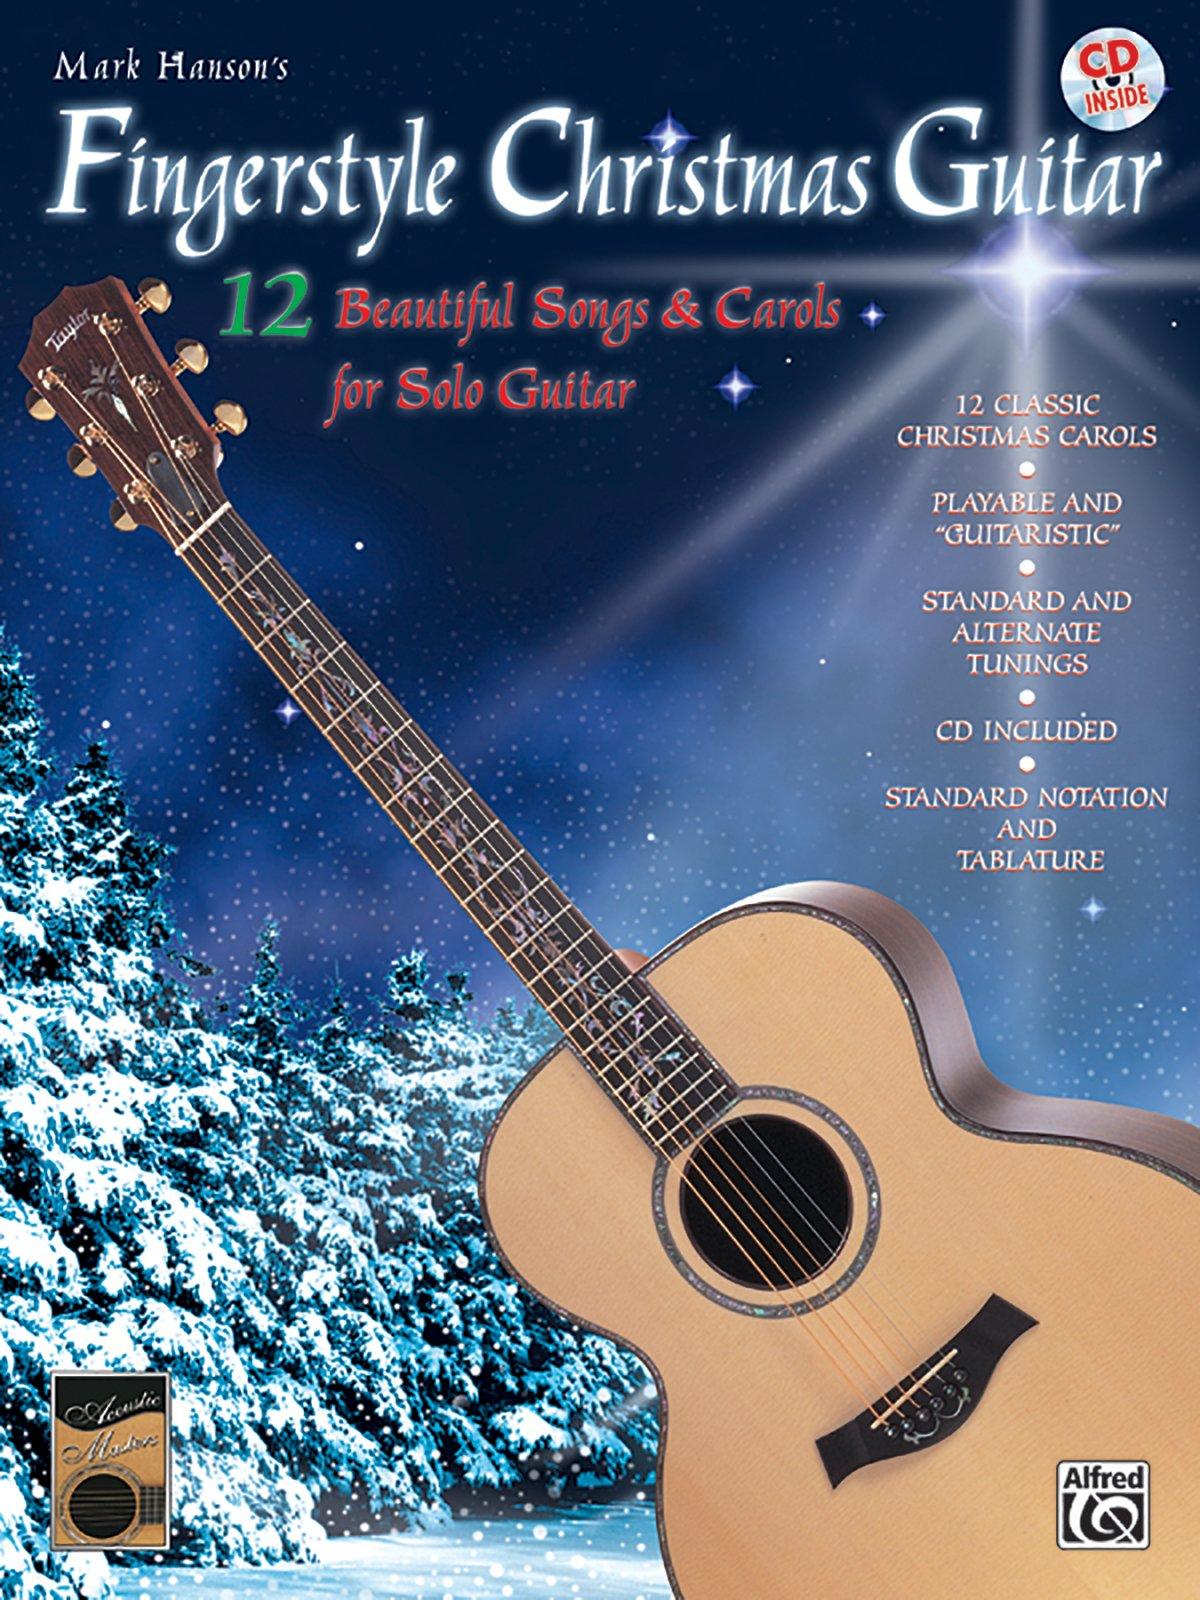 Amazon.com: Mark Hanson's Fingerstyle Christmas Guitar: (Book & CD ...